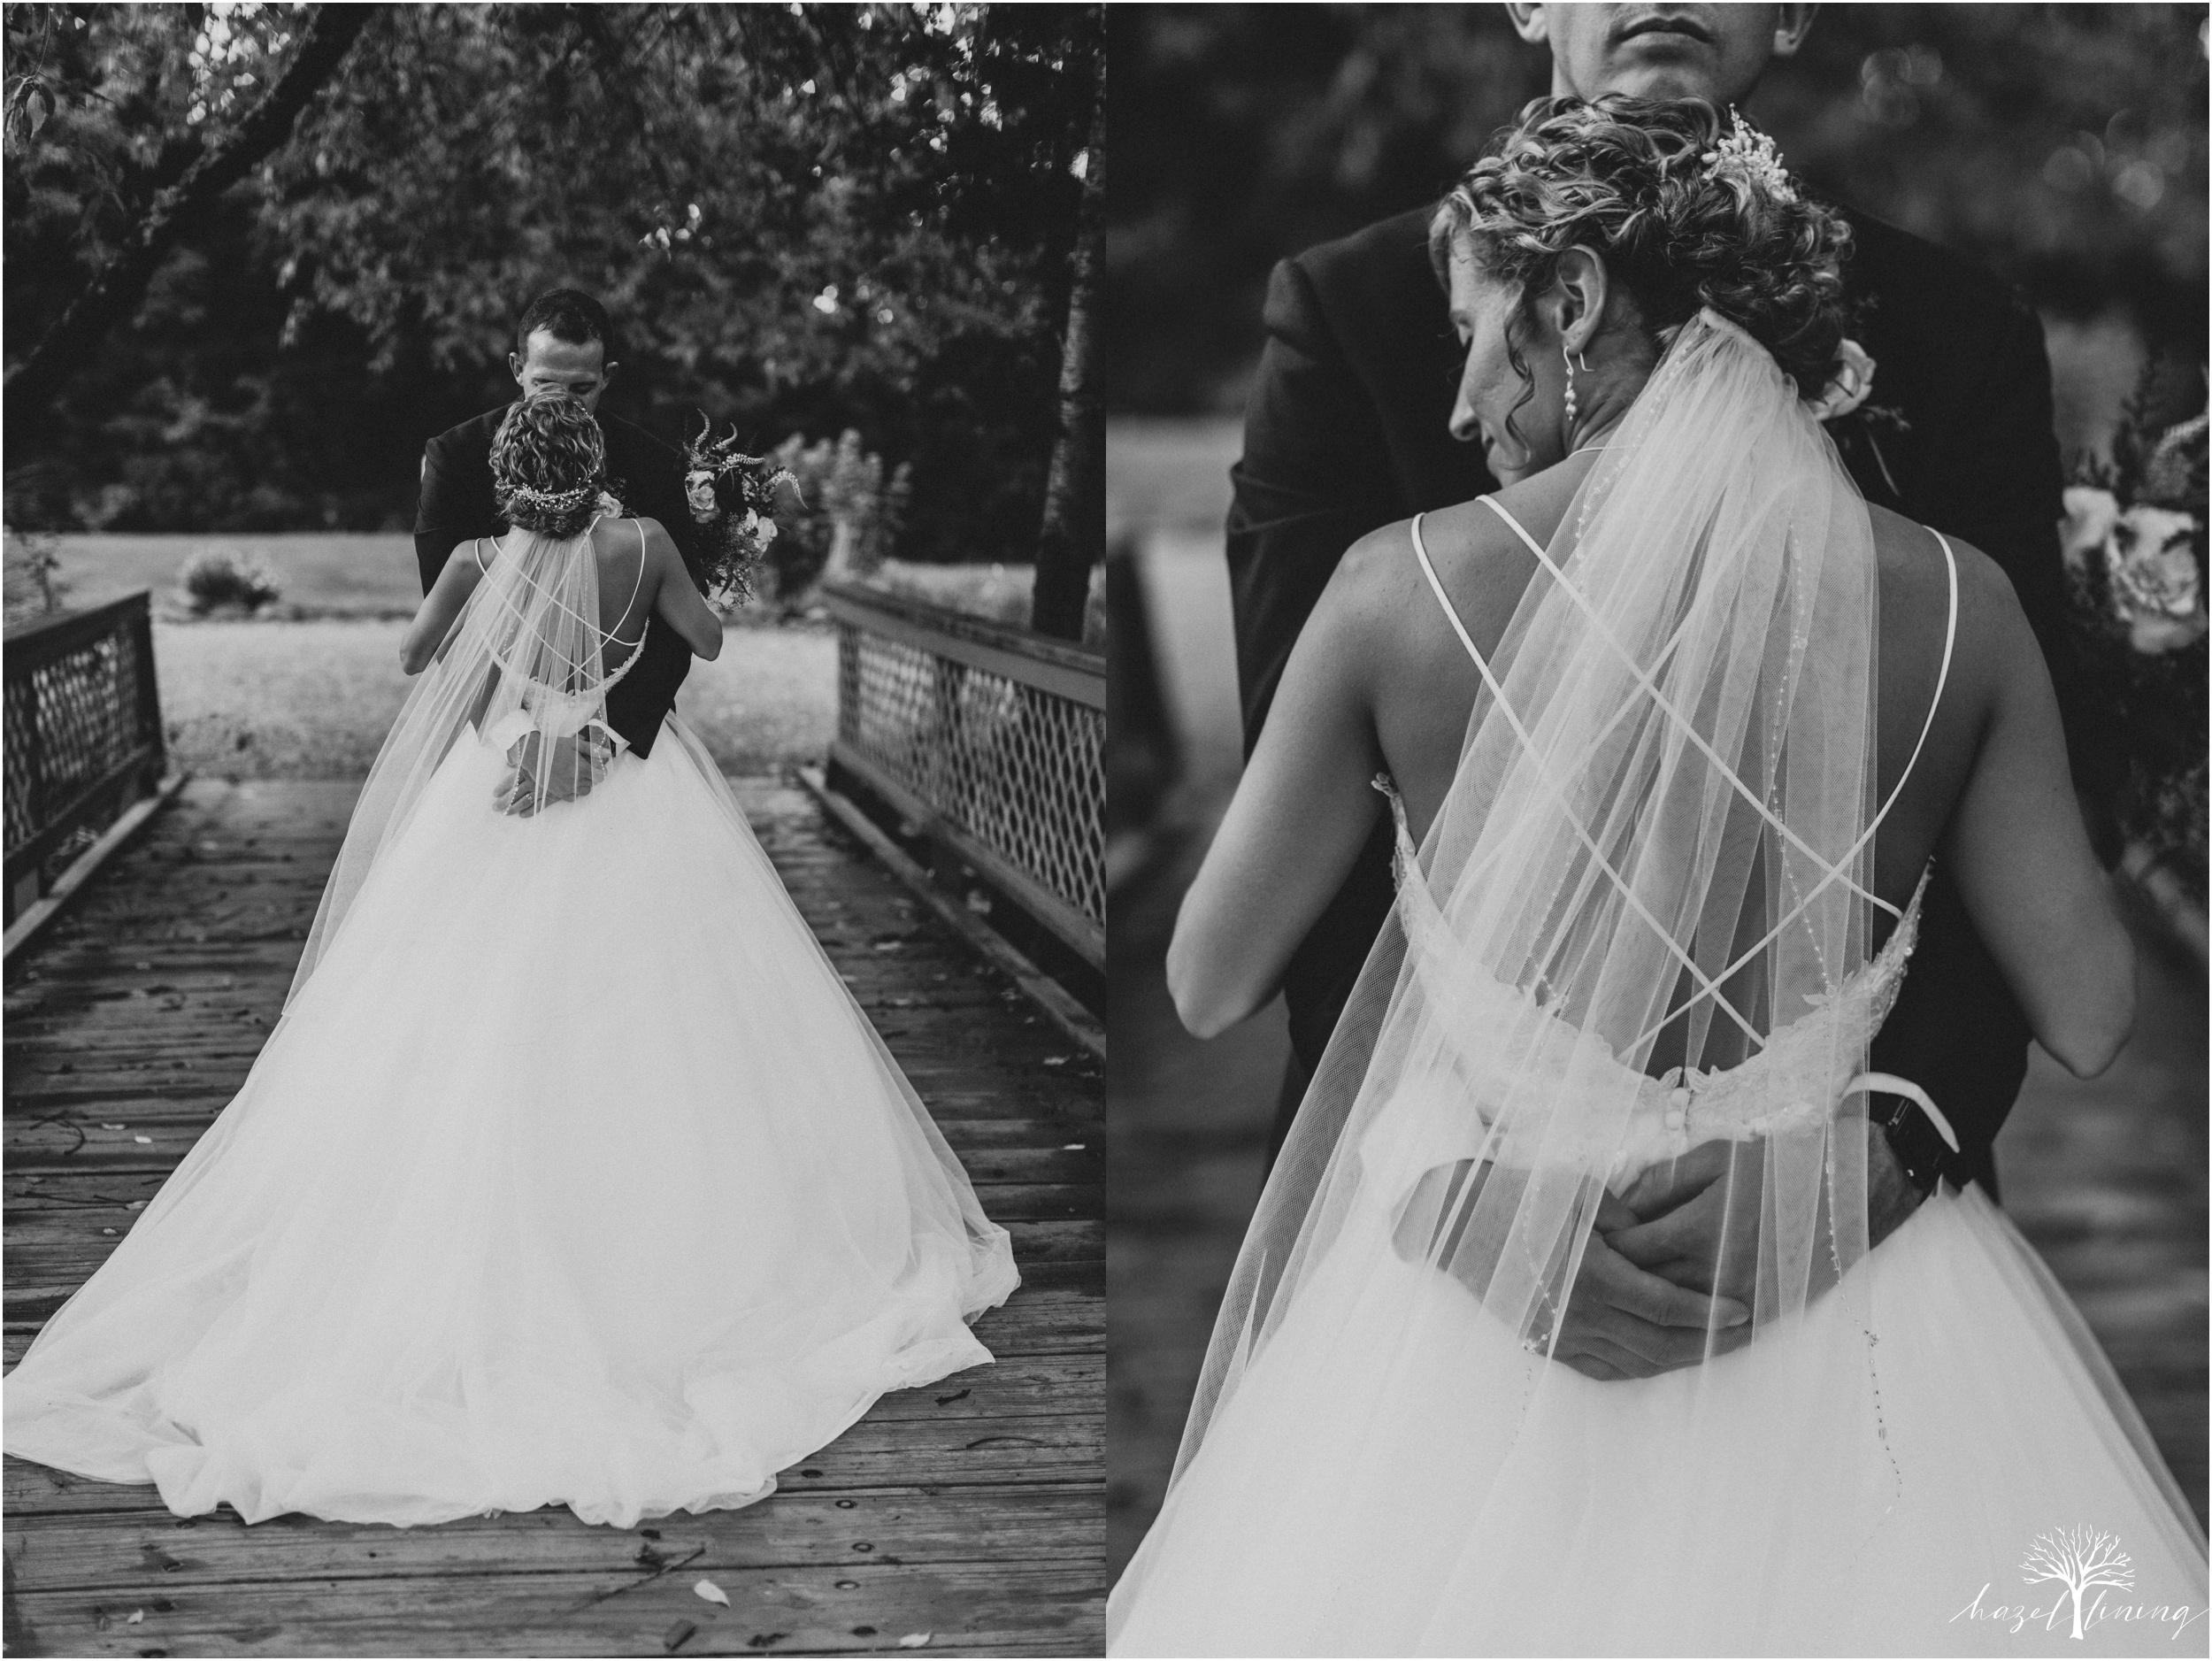 jonathan-weibel-becky-haywood-loft-at-sweetwater-cc-pennsburg-pennsylvania-rainy-day-summer-wedding-hazel-lining-travel-wedding-elopement-photography_0101.jpg